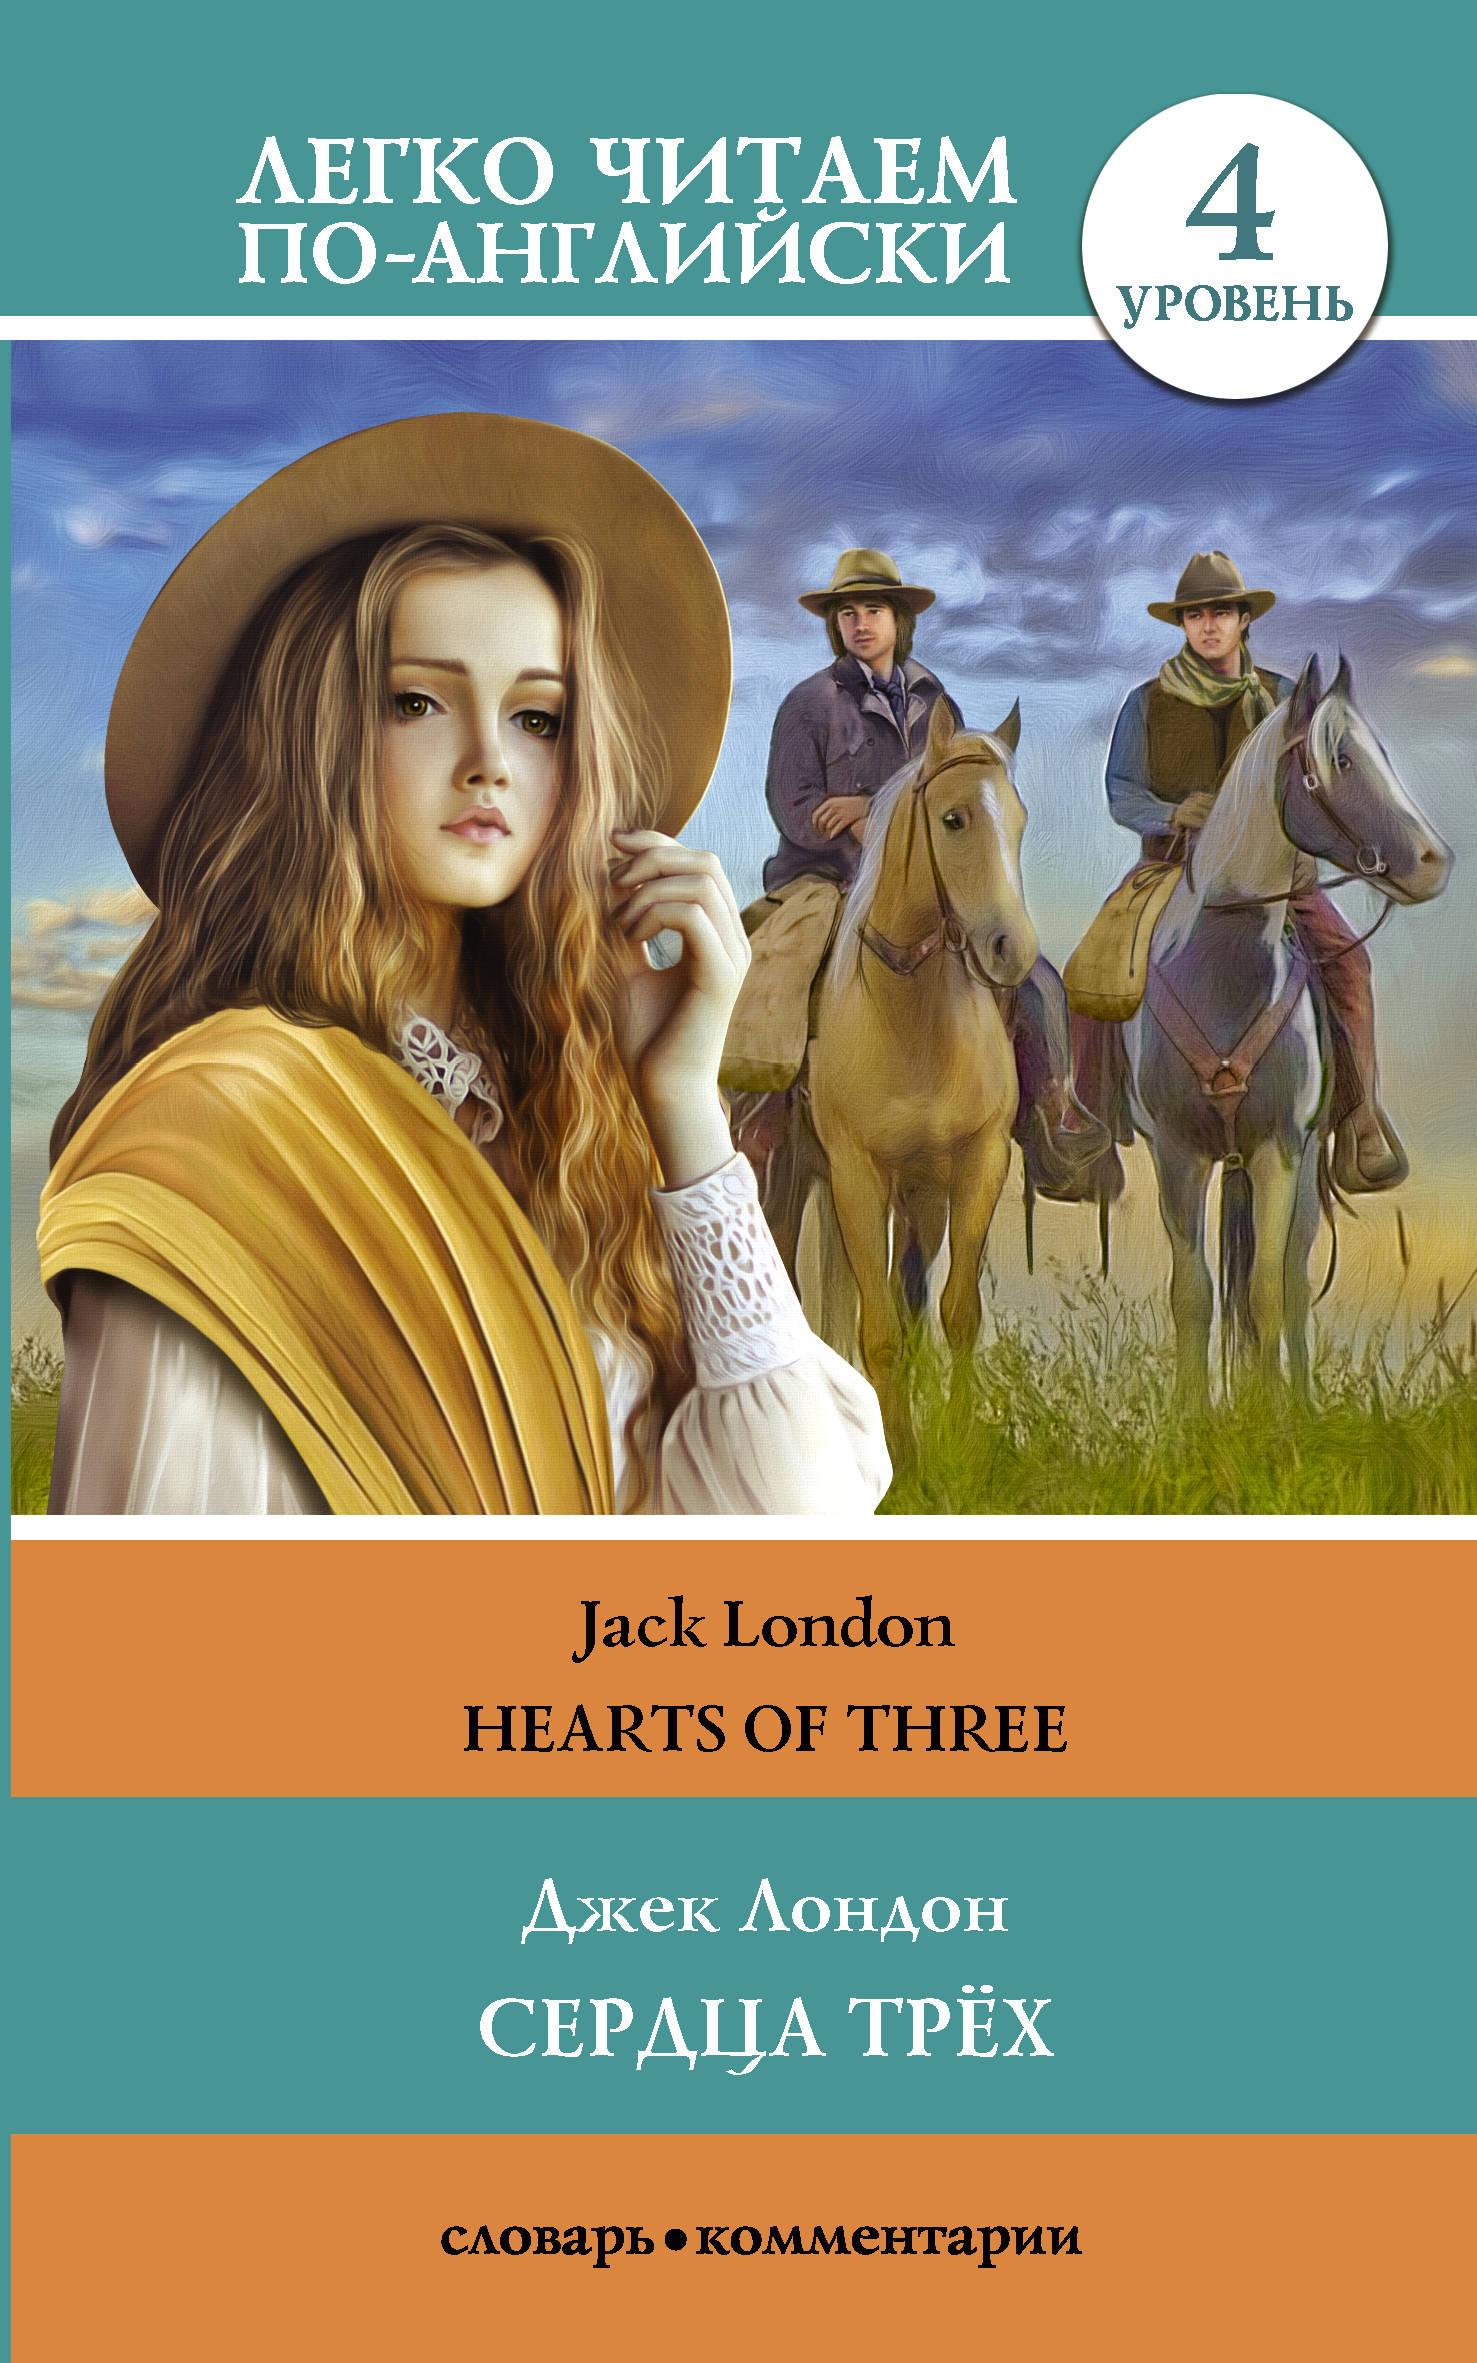 Джек Лондон Сердца трех / The Hearts of Three jack london hearts of three